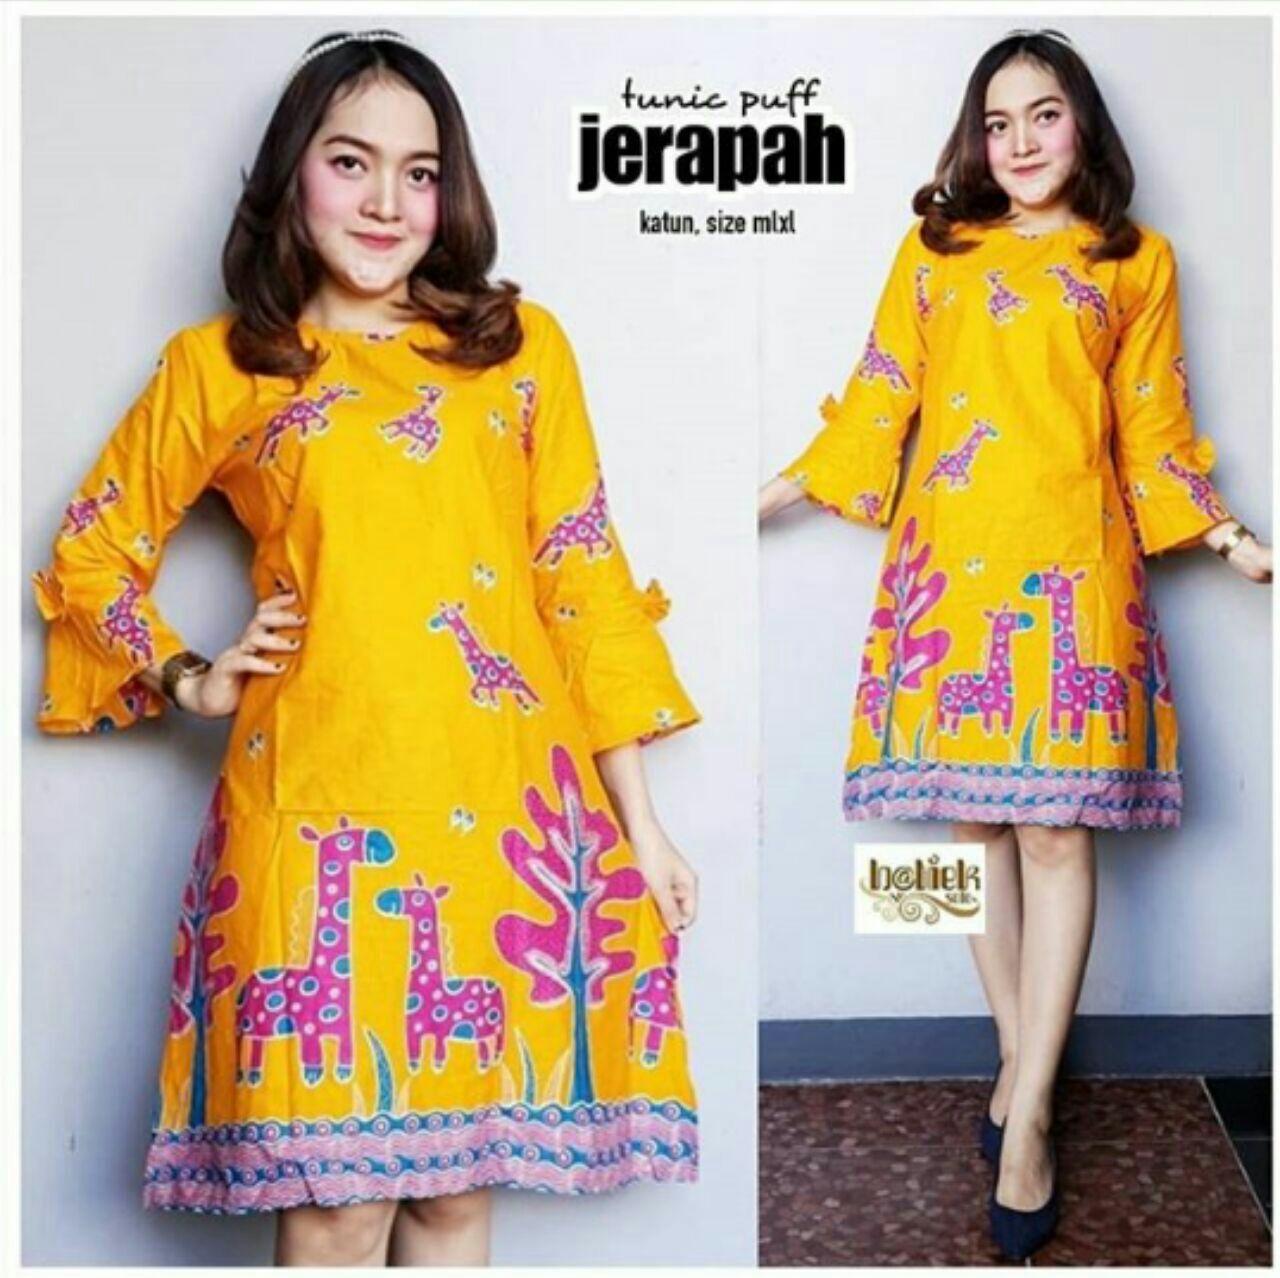 Atasan Wanita Tunik Batik Atasan Batik Wanita Baju Batik Kerja Seragam  Kantor 131731a048